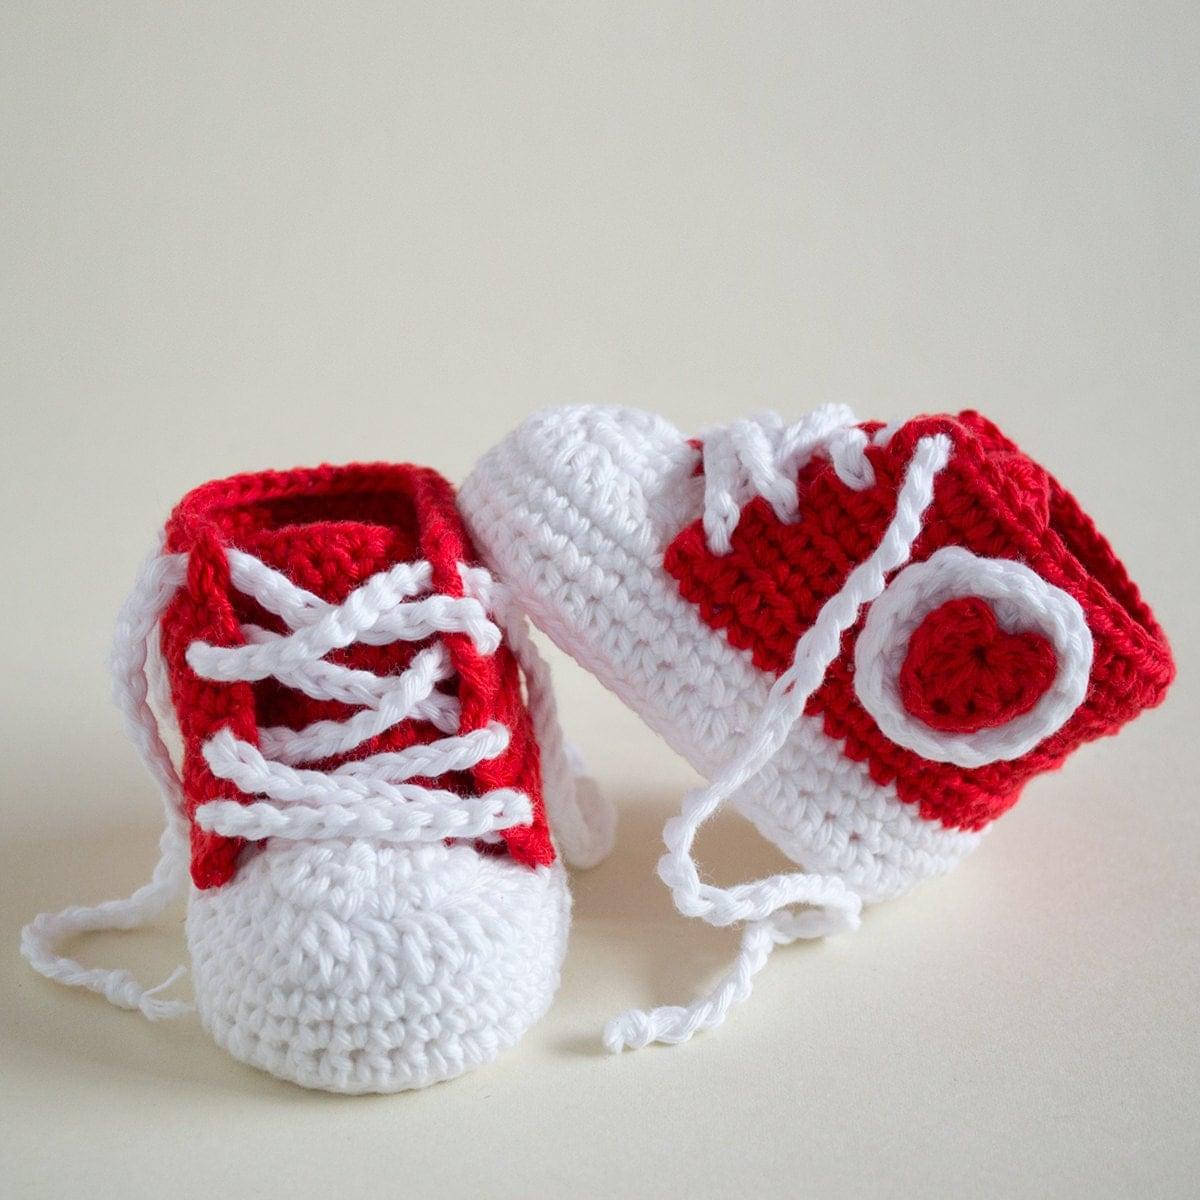 CROCHET PATTERN Crochet Baby Booties Fancy Baby Baby Shoes